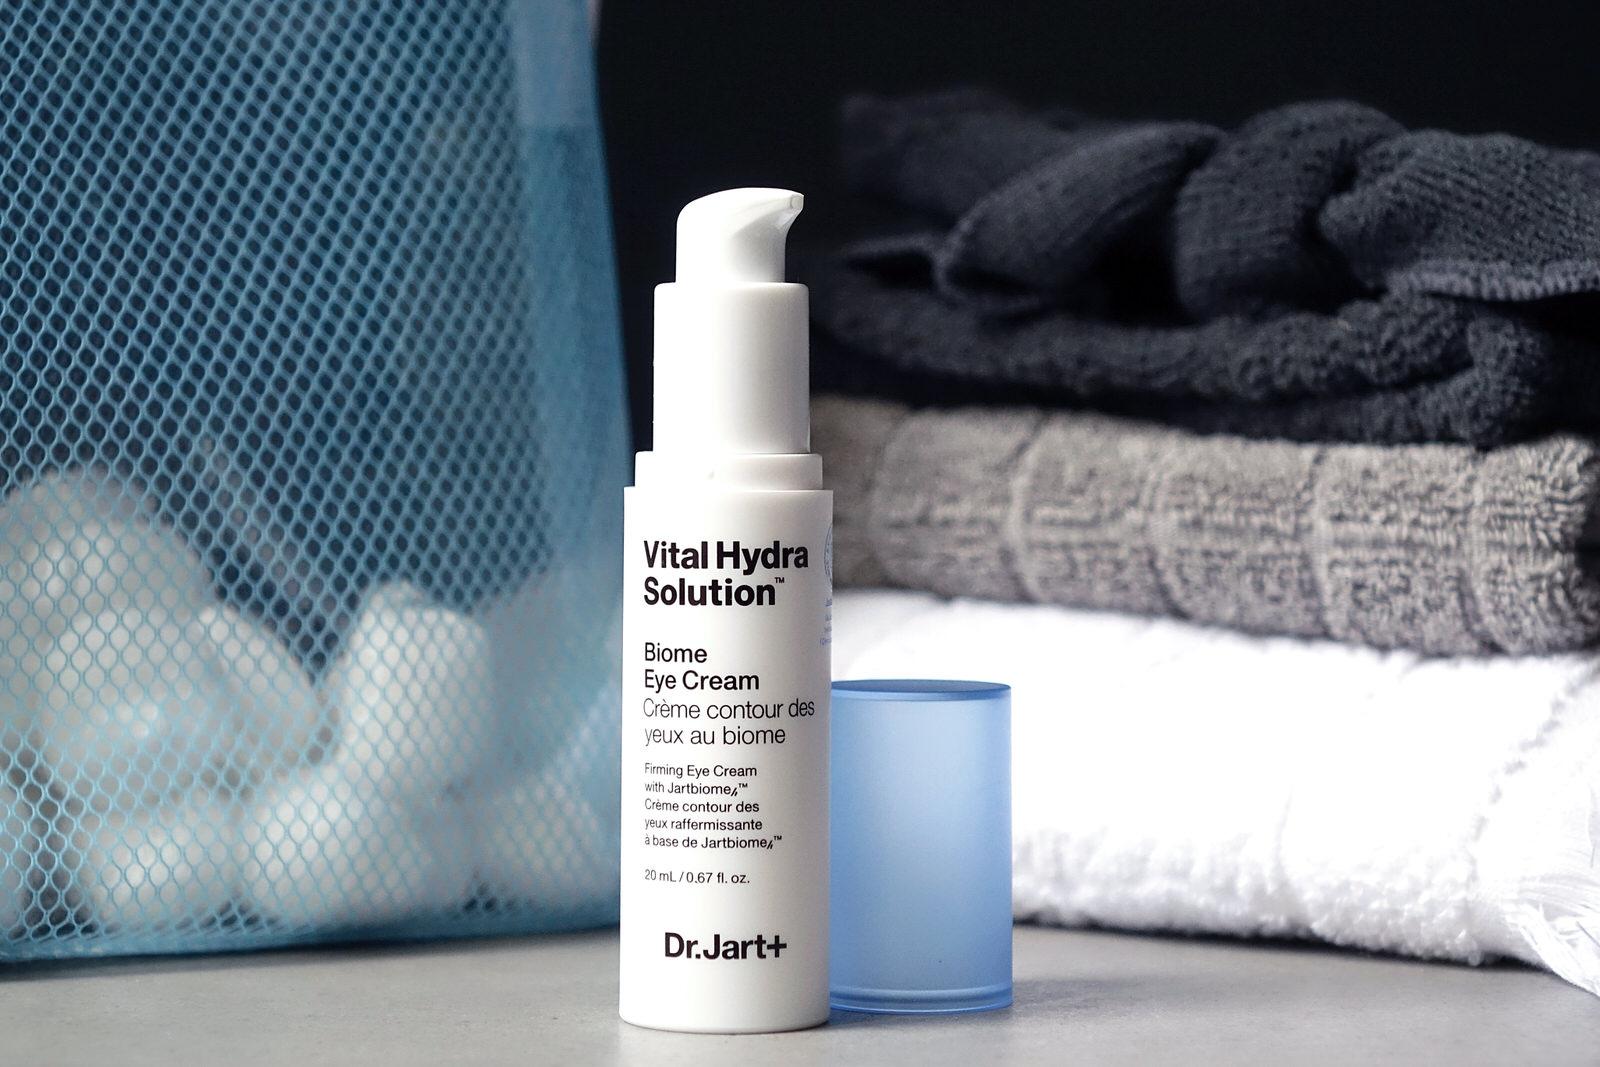 La gamme Vital Hydra Solution du Dr Jart+